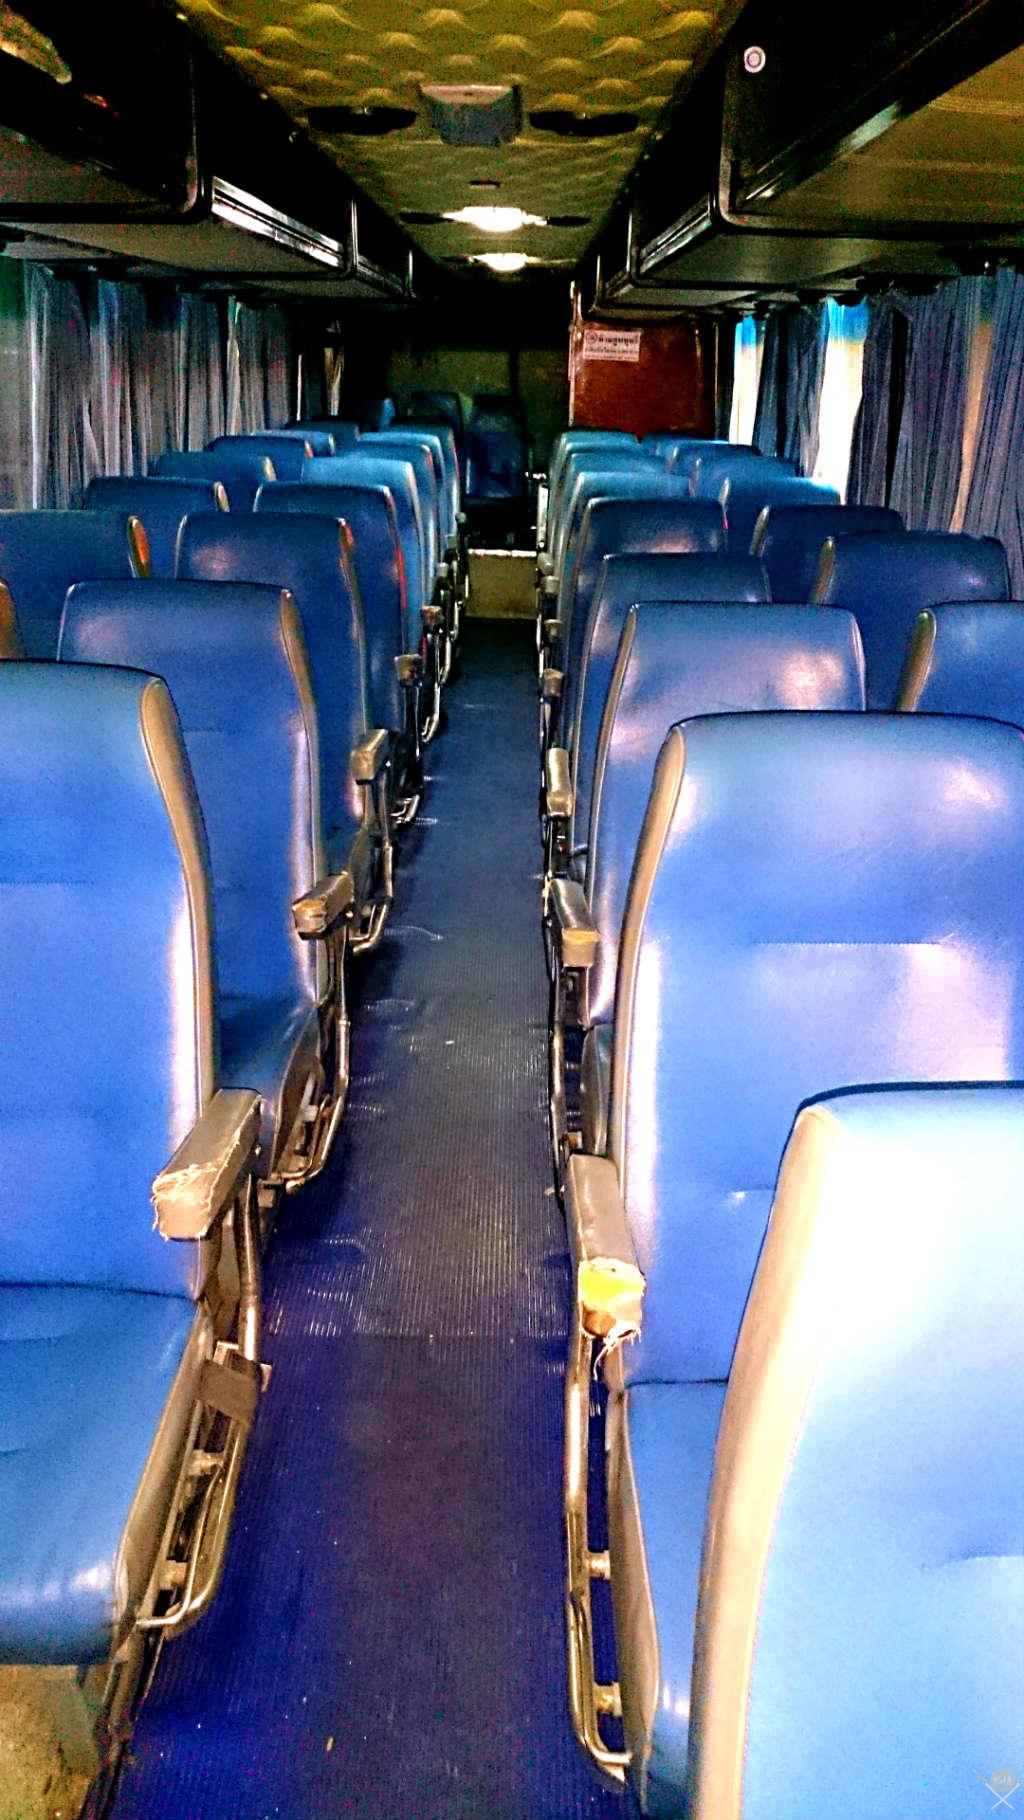 Thailand Kanchanaburi Bus Vida de Tsuge VDT 1024x1820